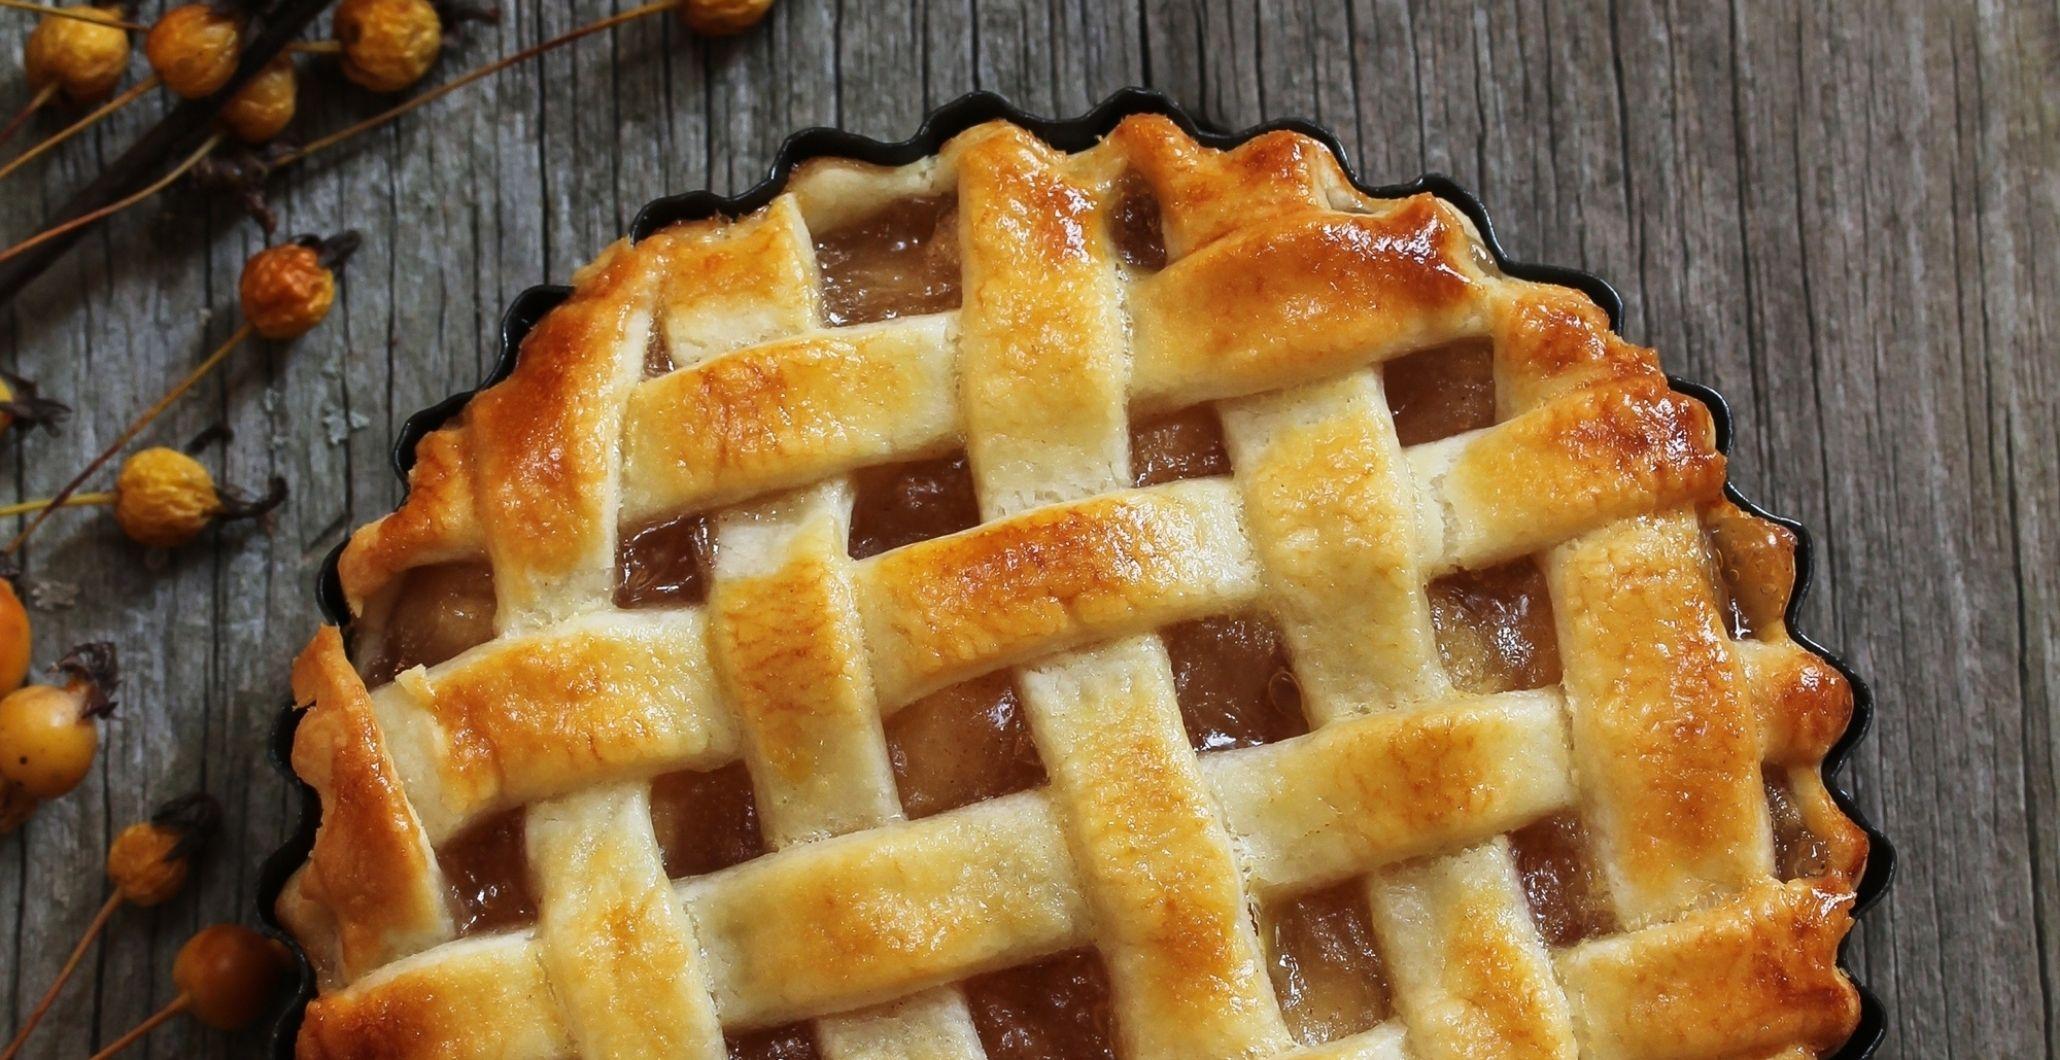 Apple Pie Workshop